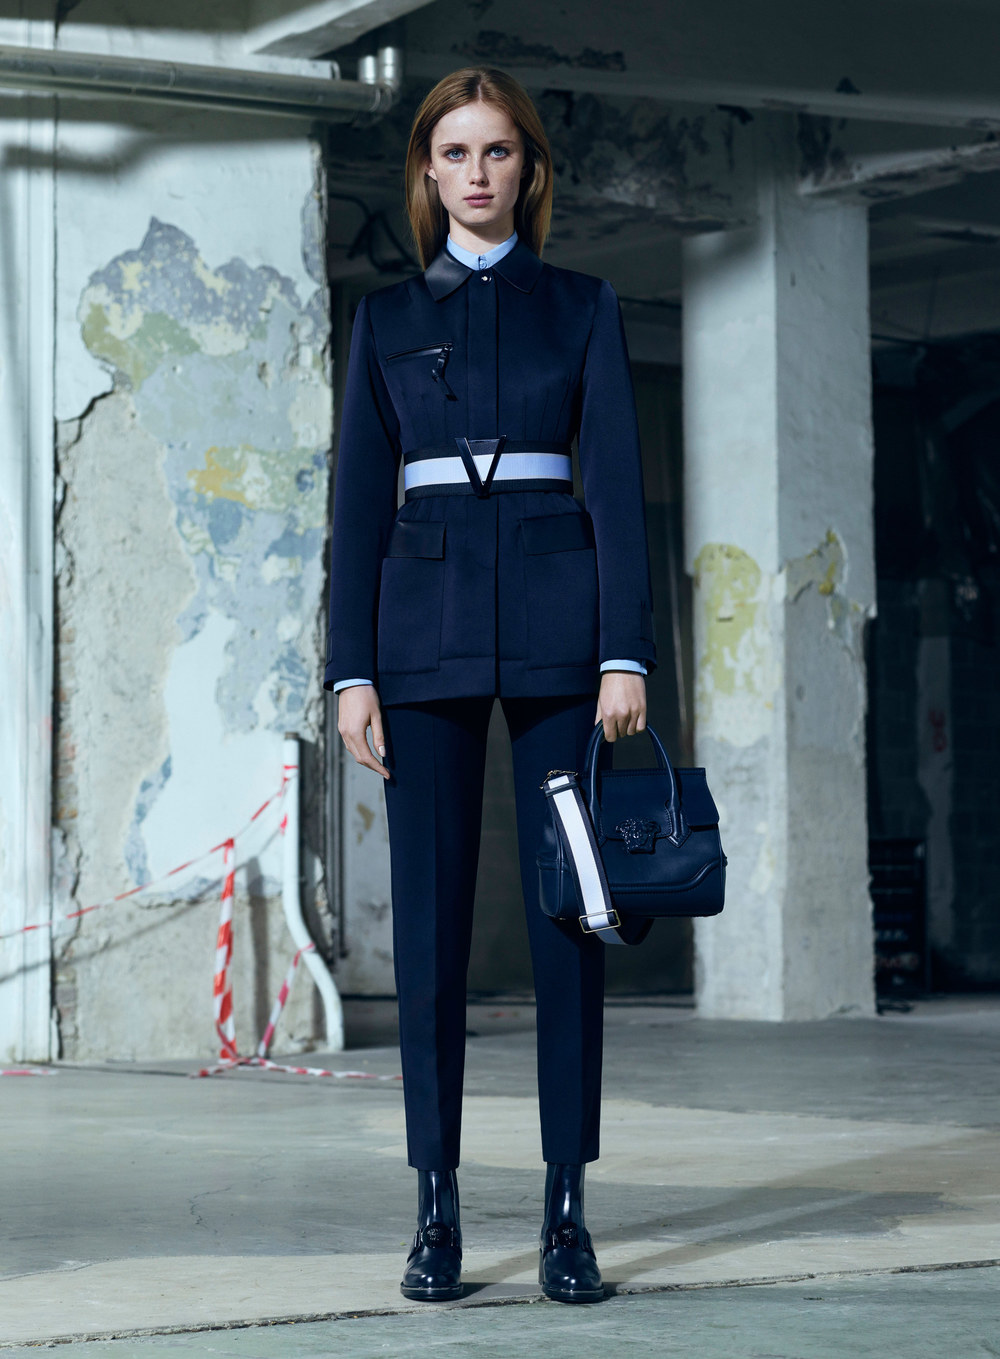 versace-pre-fall-2016-lookbook-03.jpg